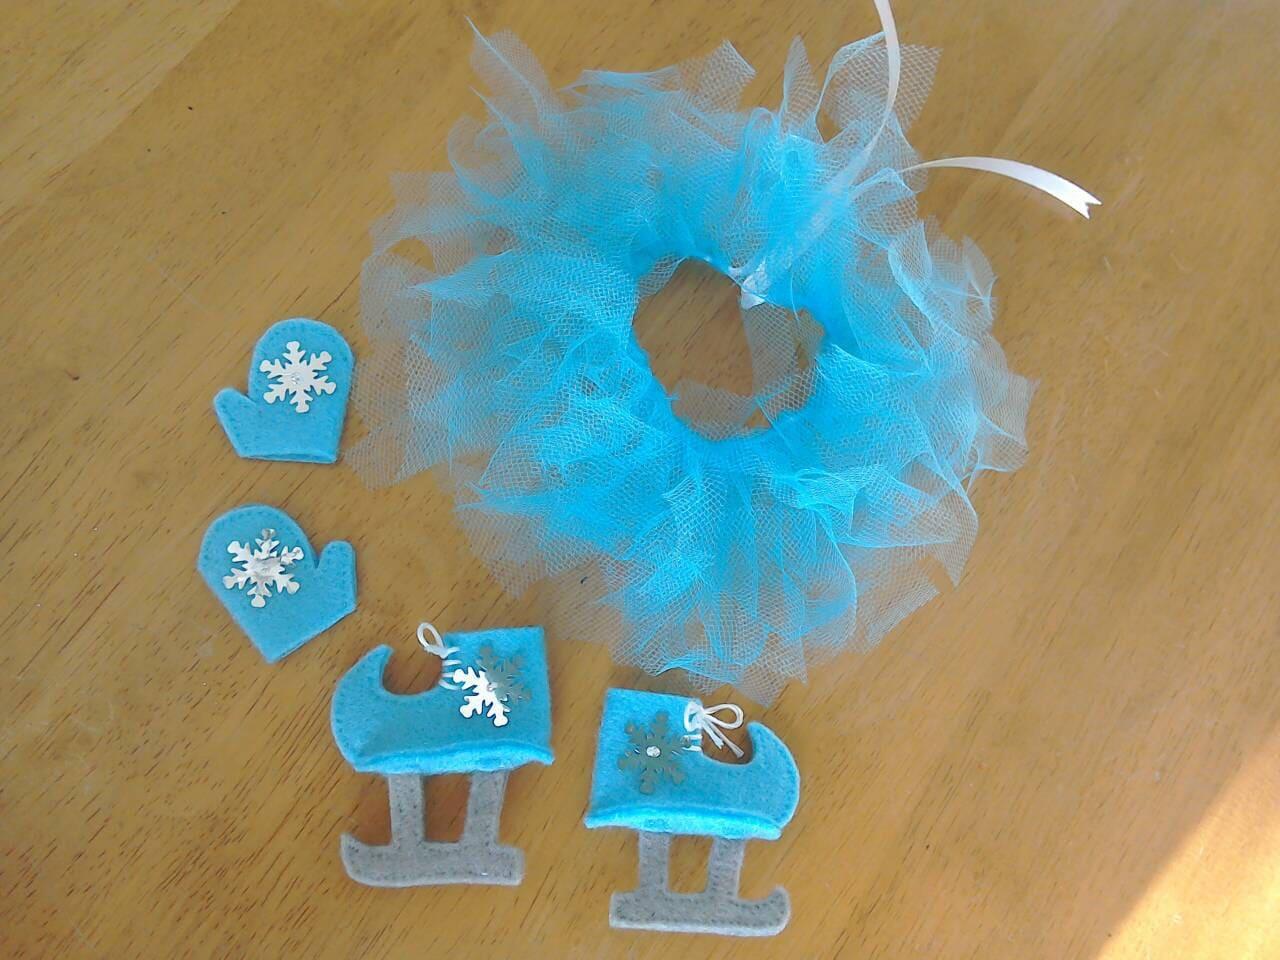 Felt elf ice figure skating set in blue